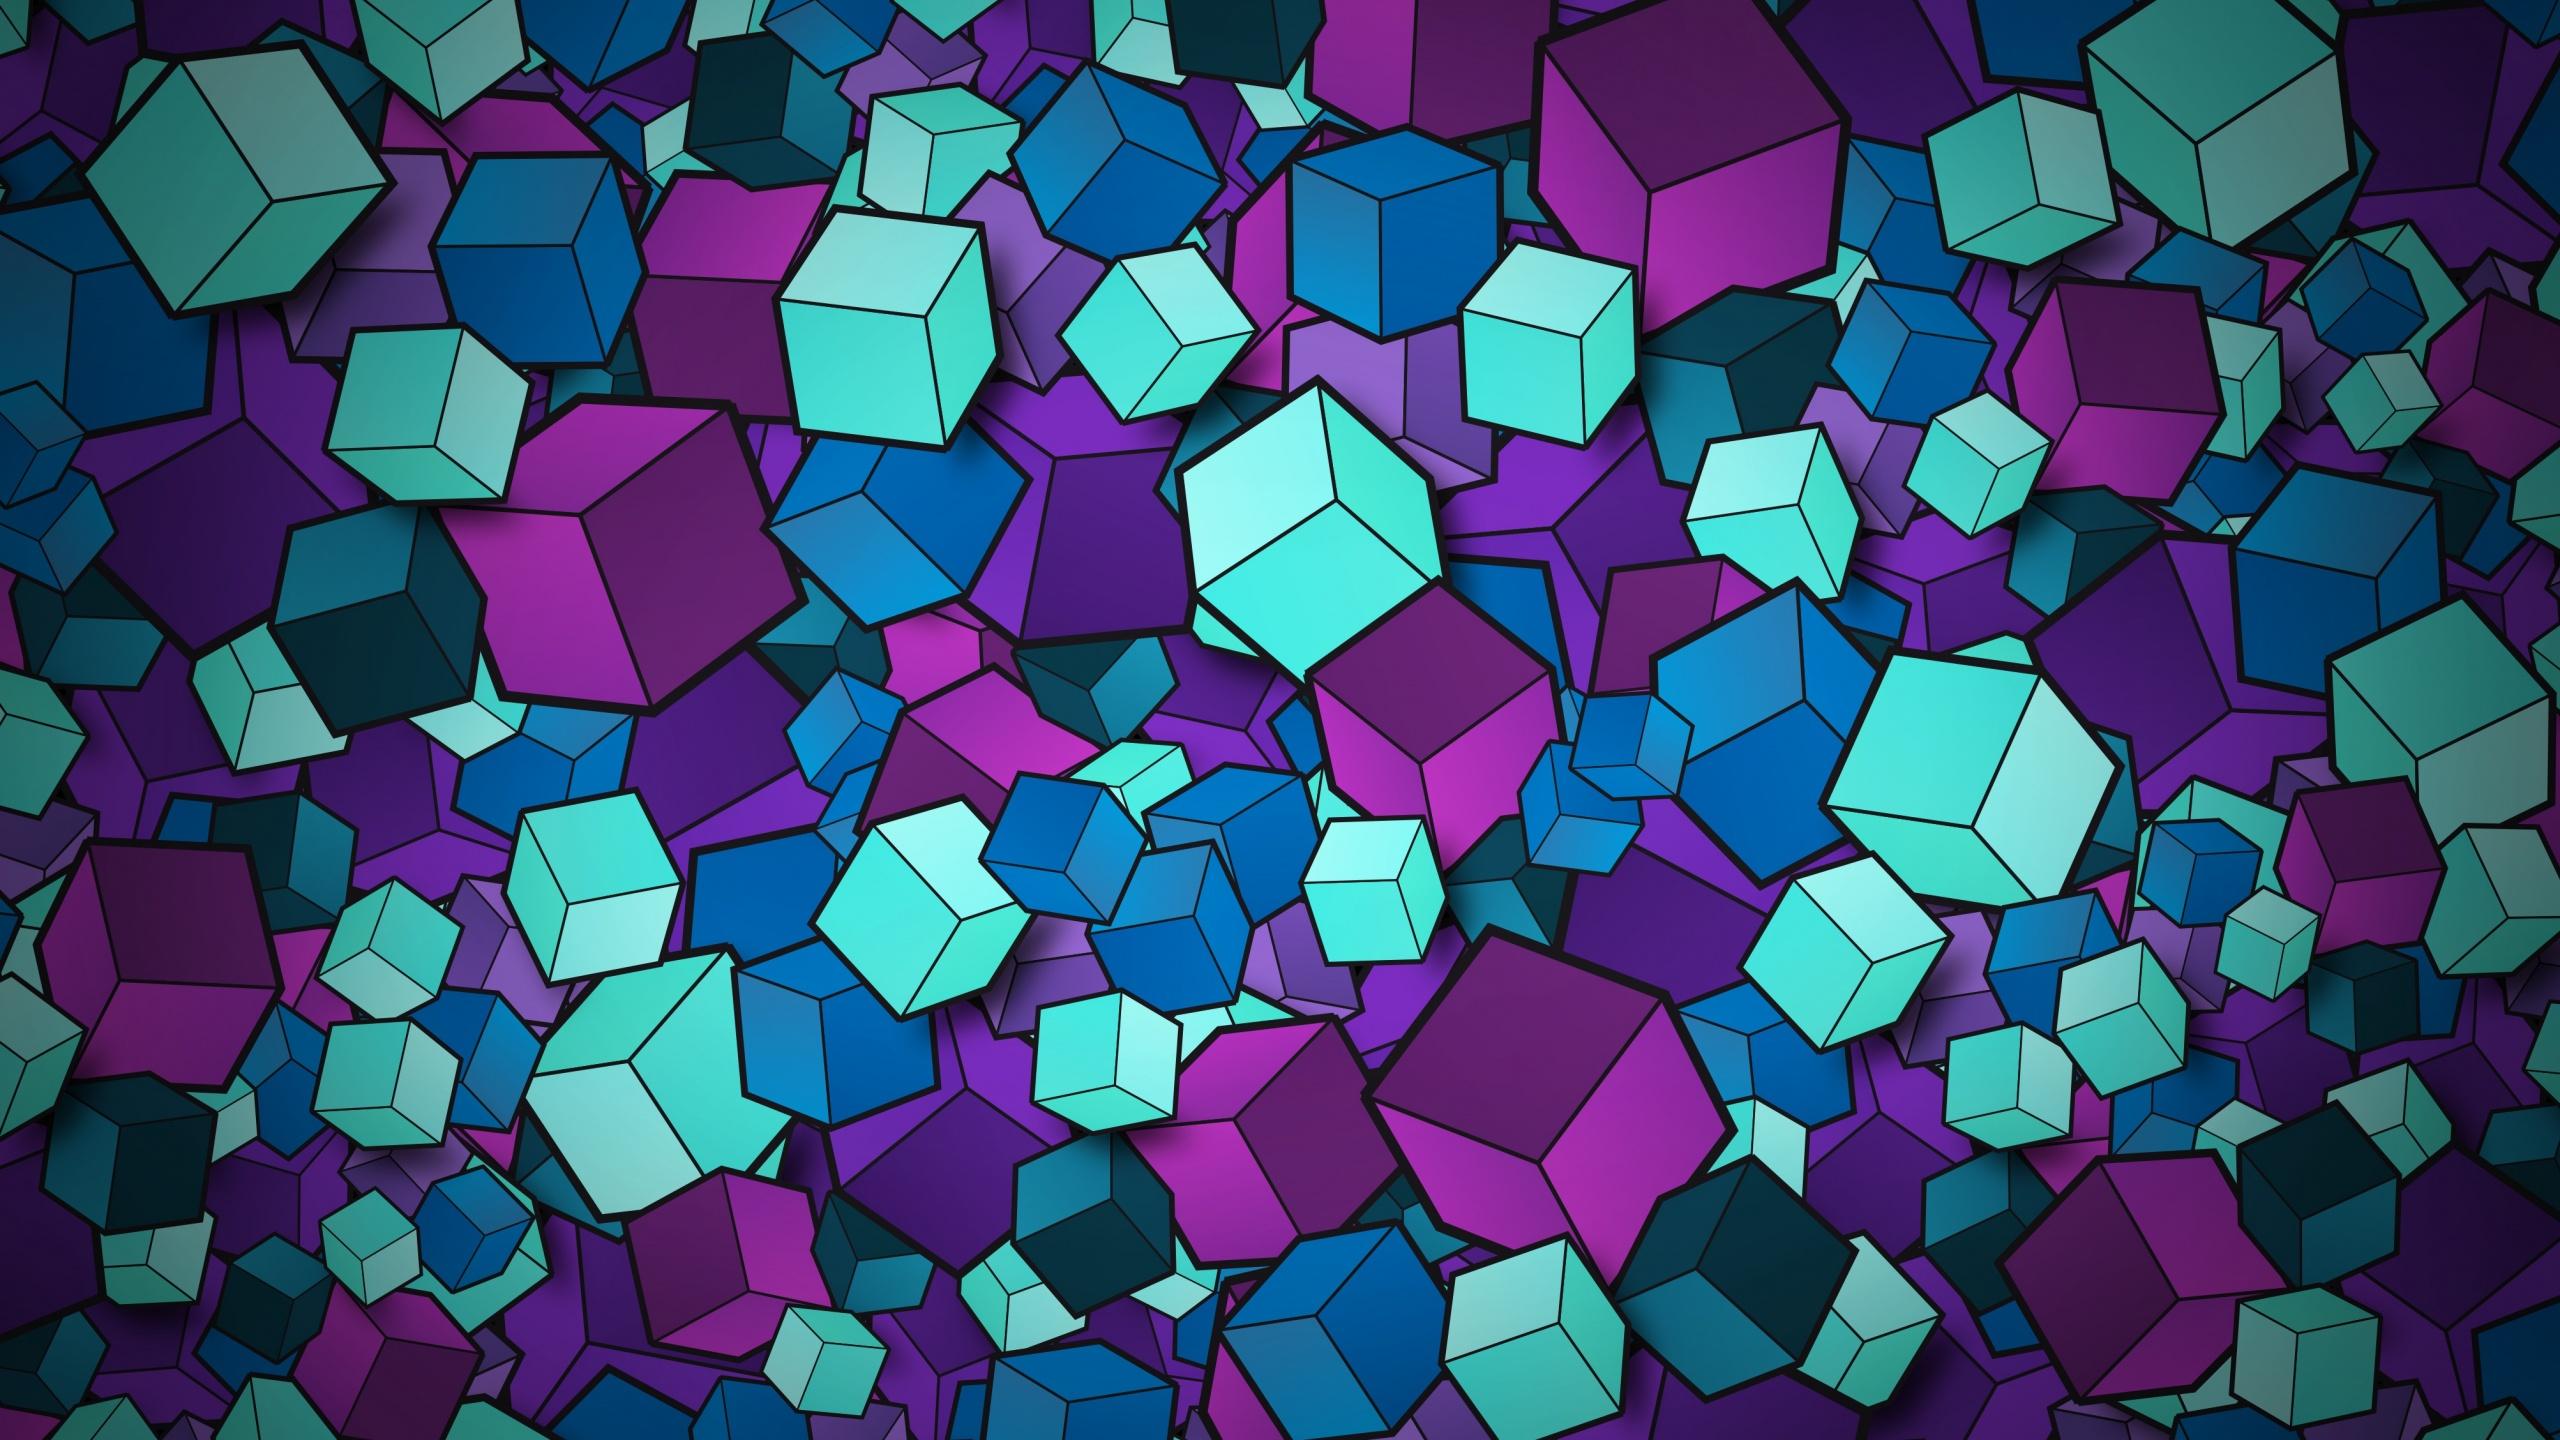 3D cubes 4K Wallpaper Colorful Geometric Patterns